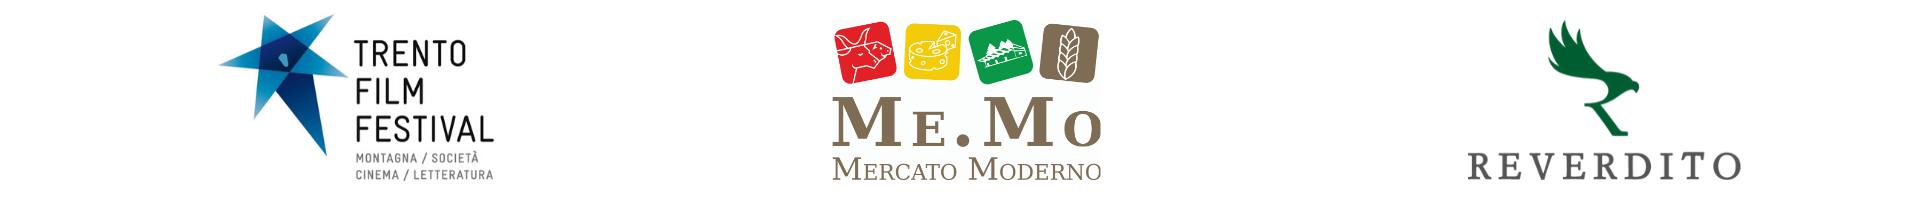 FilmFestival-MeMo-Reverdito